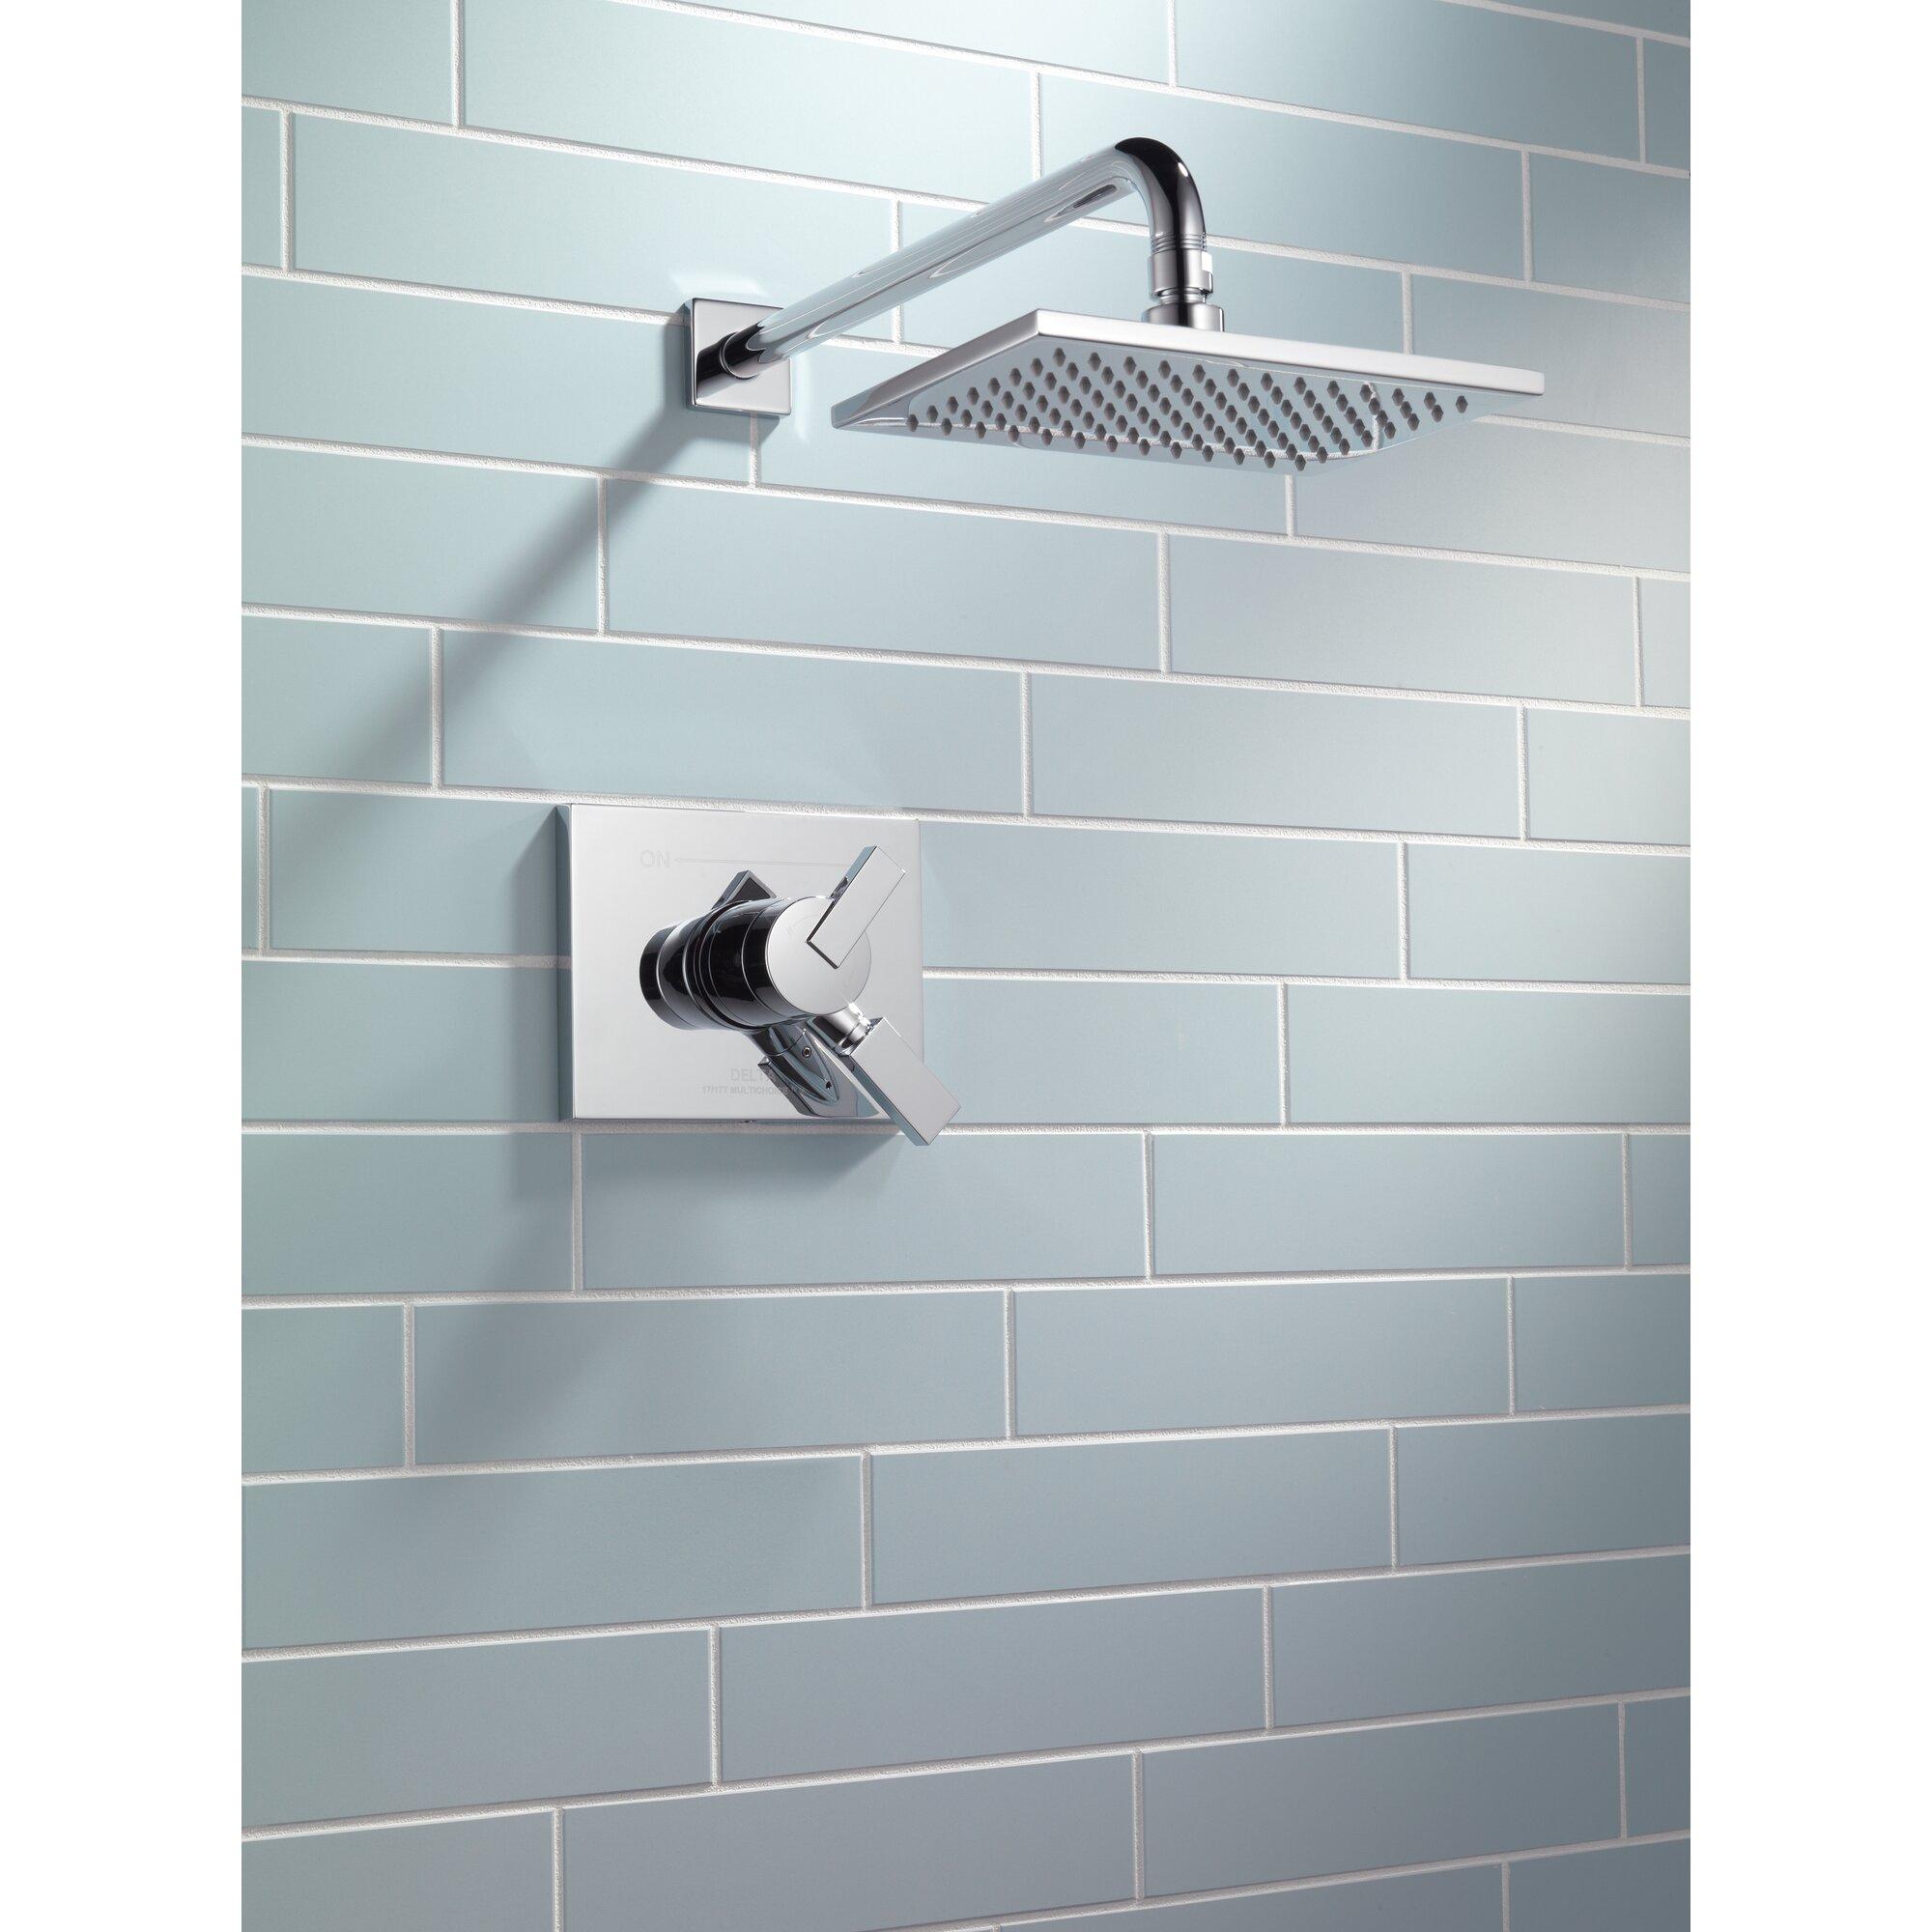 Amazoncom Rinse Ace Pet Deluxe Shower Sprayer Home Improvement ...